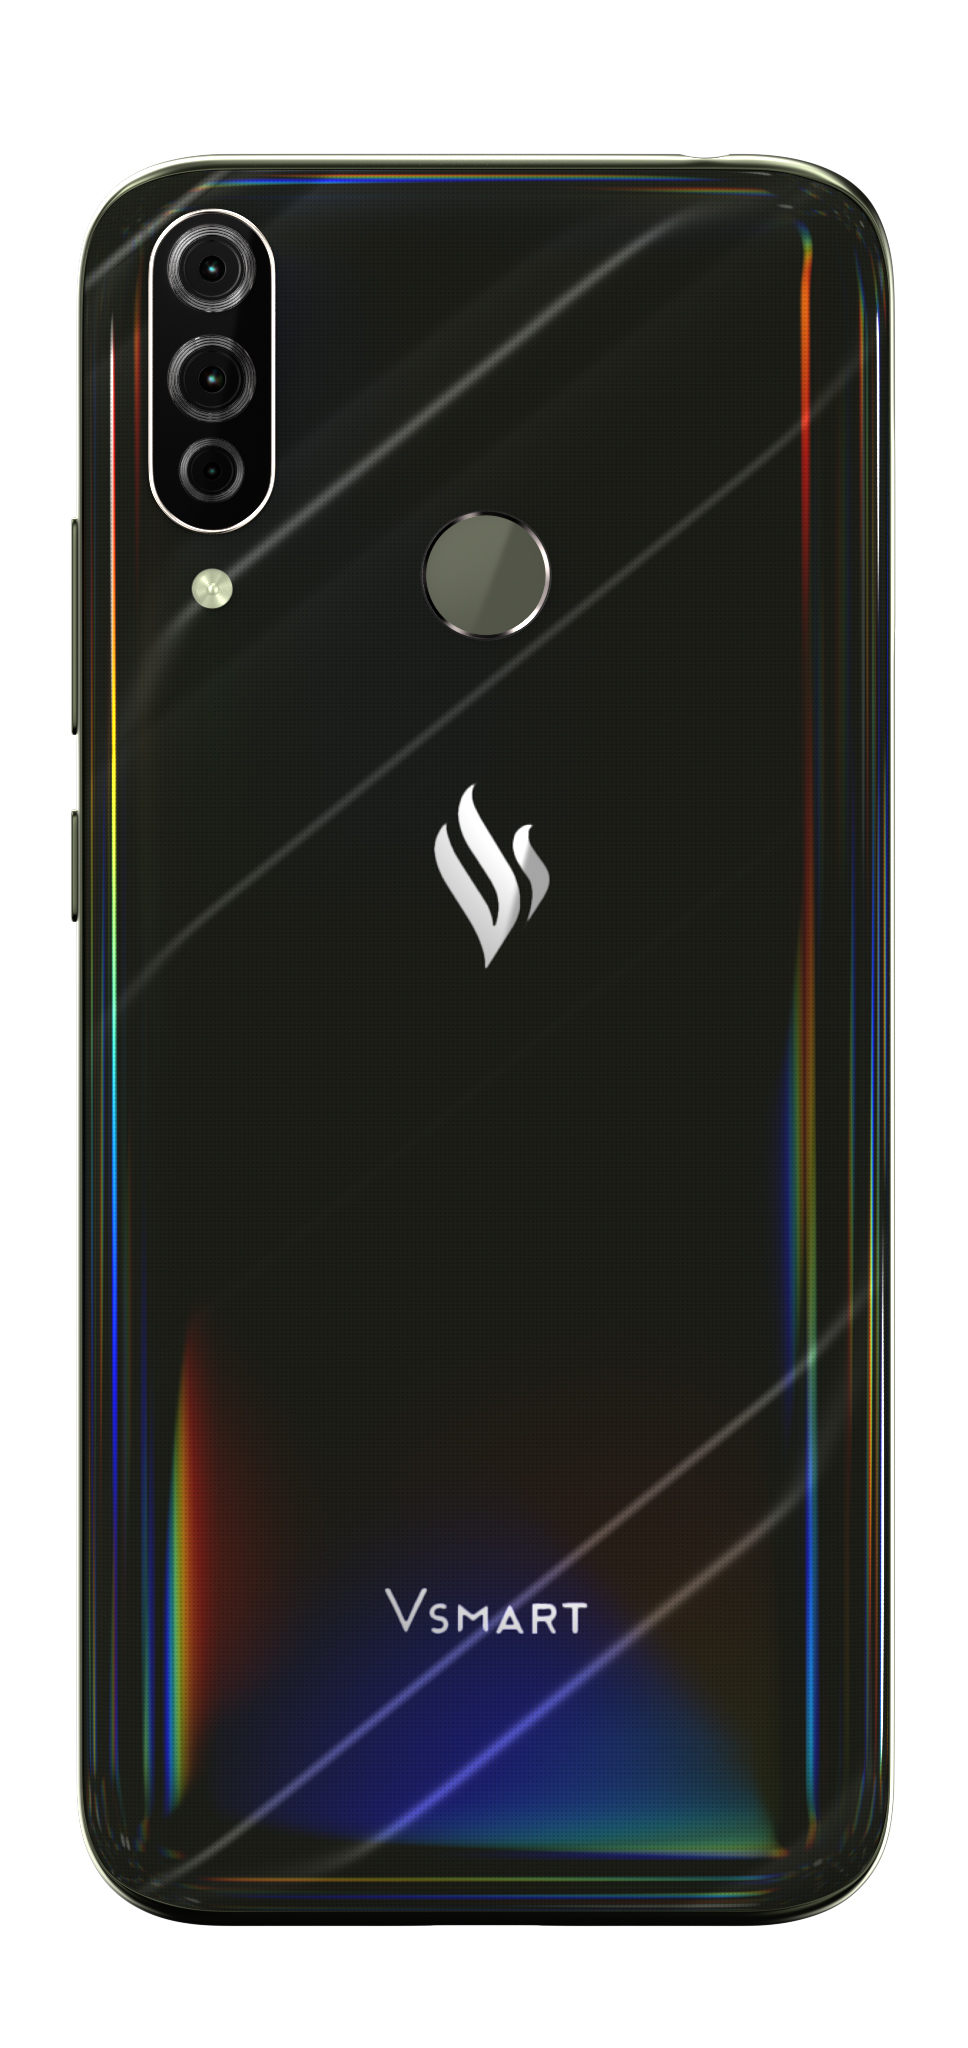 Анонс Vsmart Joy 3+ за 10 000 рублей. Snapdragon 632 и NFC Другие устройства  - anons_vsmart_joy_3_nfs_avtonomnost_i_snapdragon_do_10_000_rublej_2